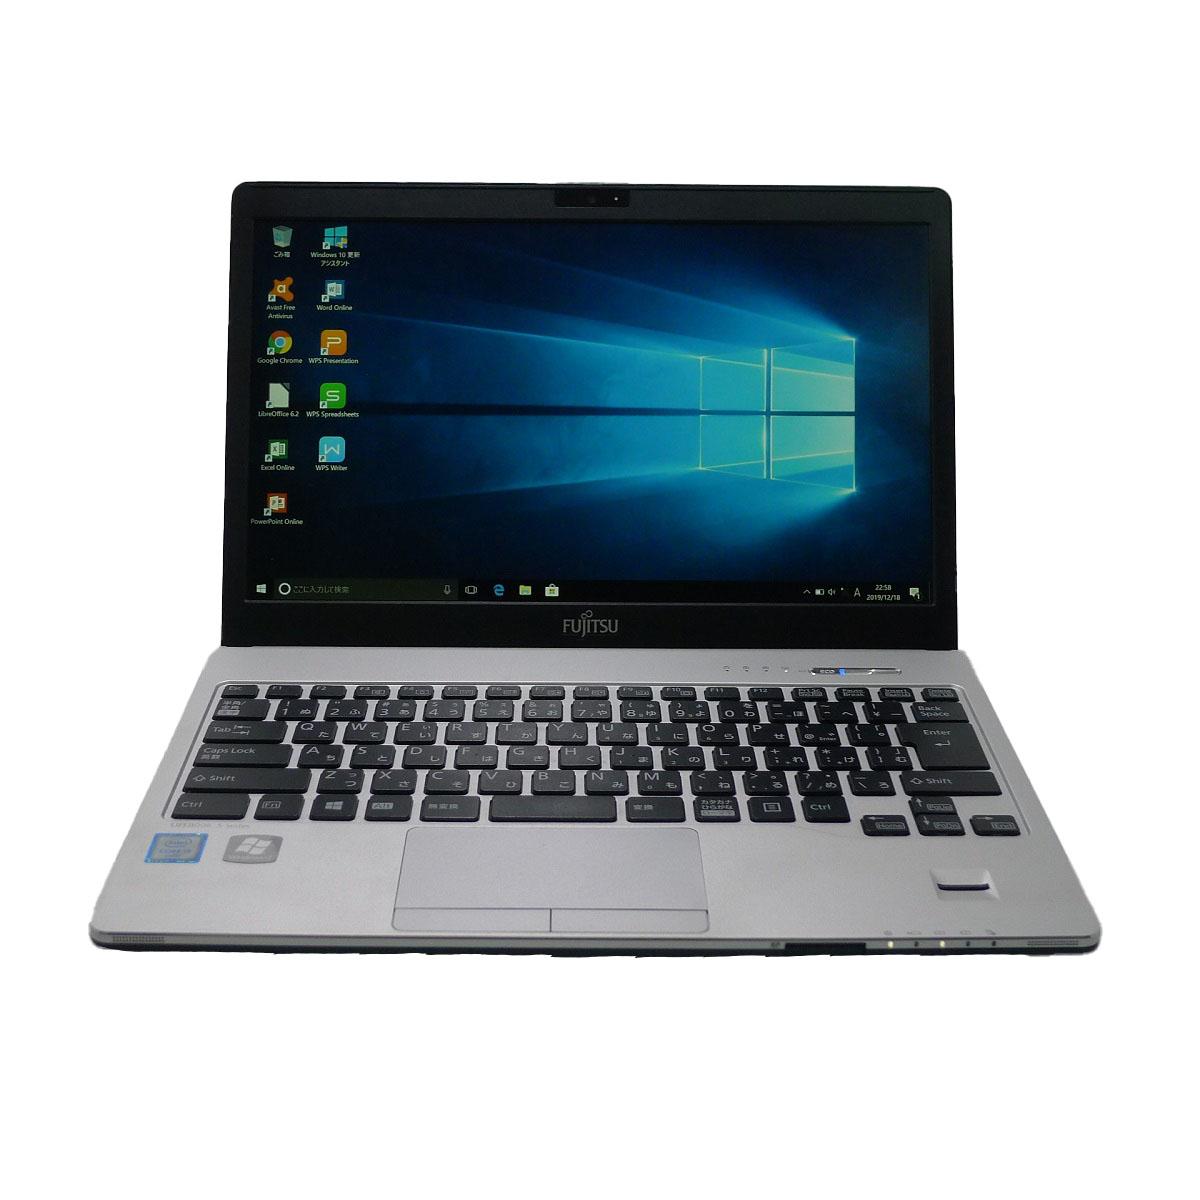 FUJITSU LIFEBOOK S936 Core i5 4GB SSD240GB 無線LAN フルHD Windows10 64bitWPSOffice 13.3インチ モバイルノート 中古 中古パソコン 【中古】